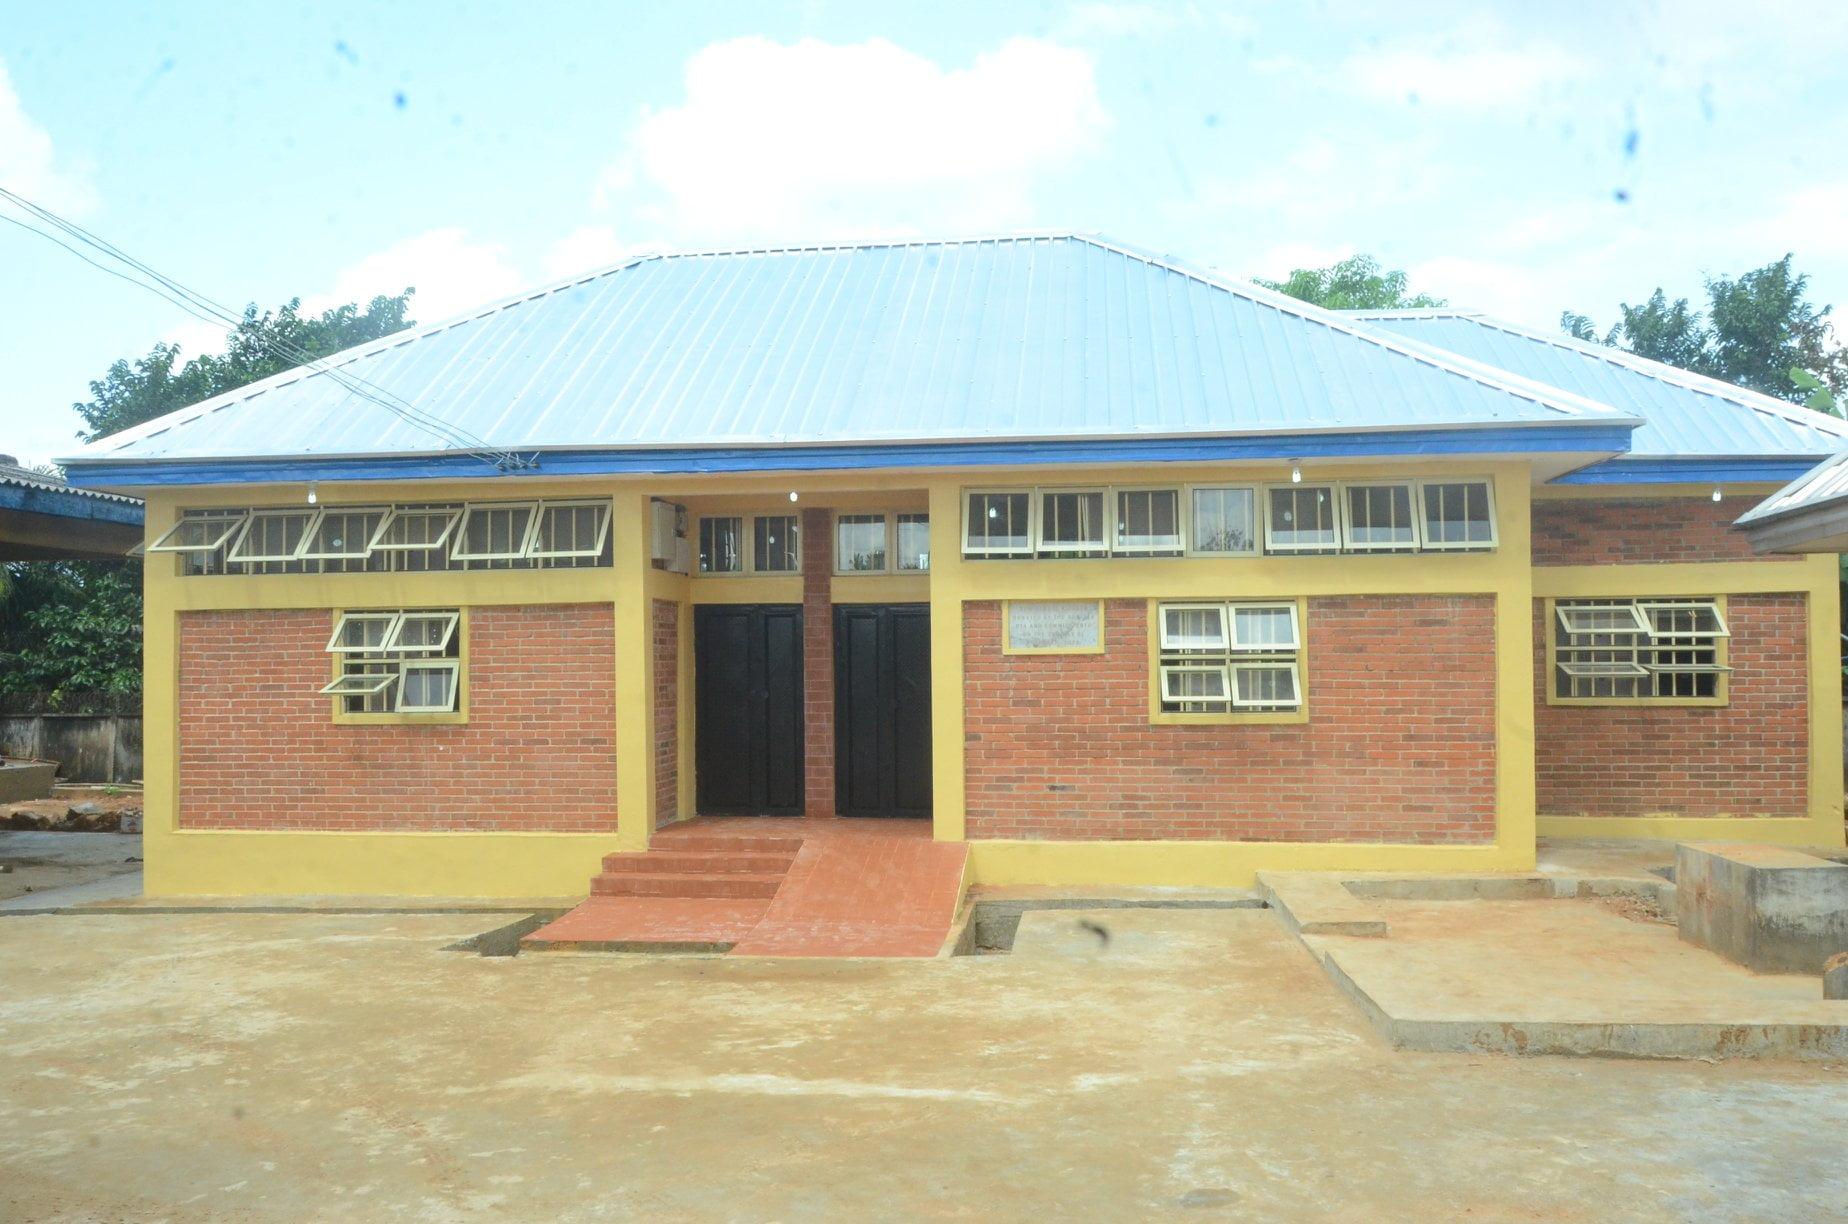 New School Kitchen donated by the 201718 Parent Teacher Association 1